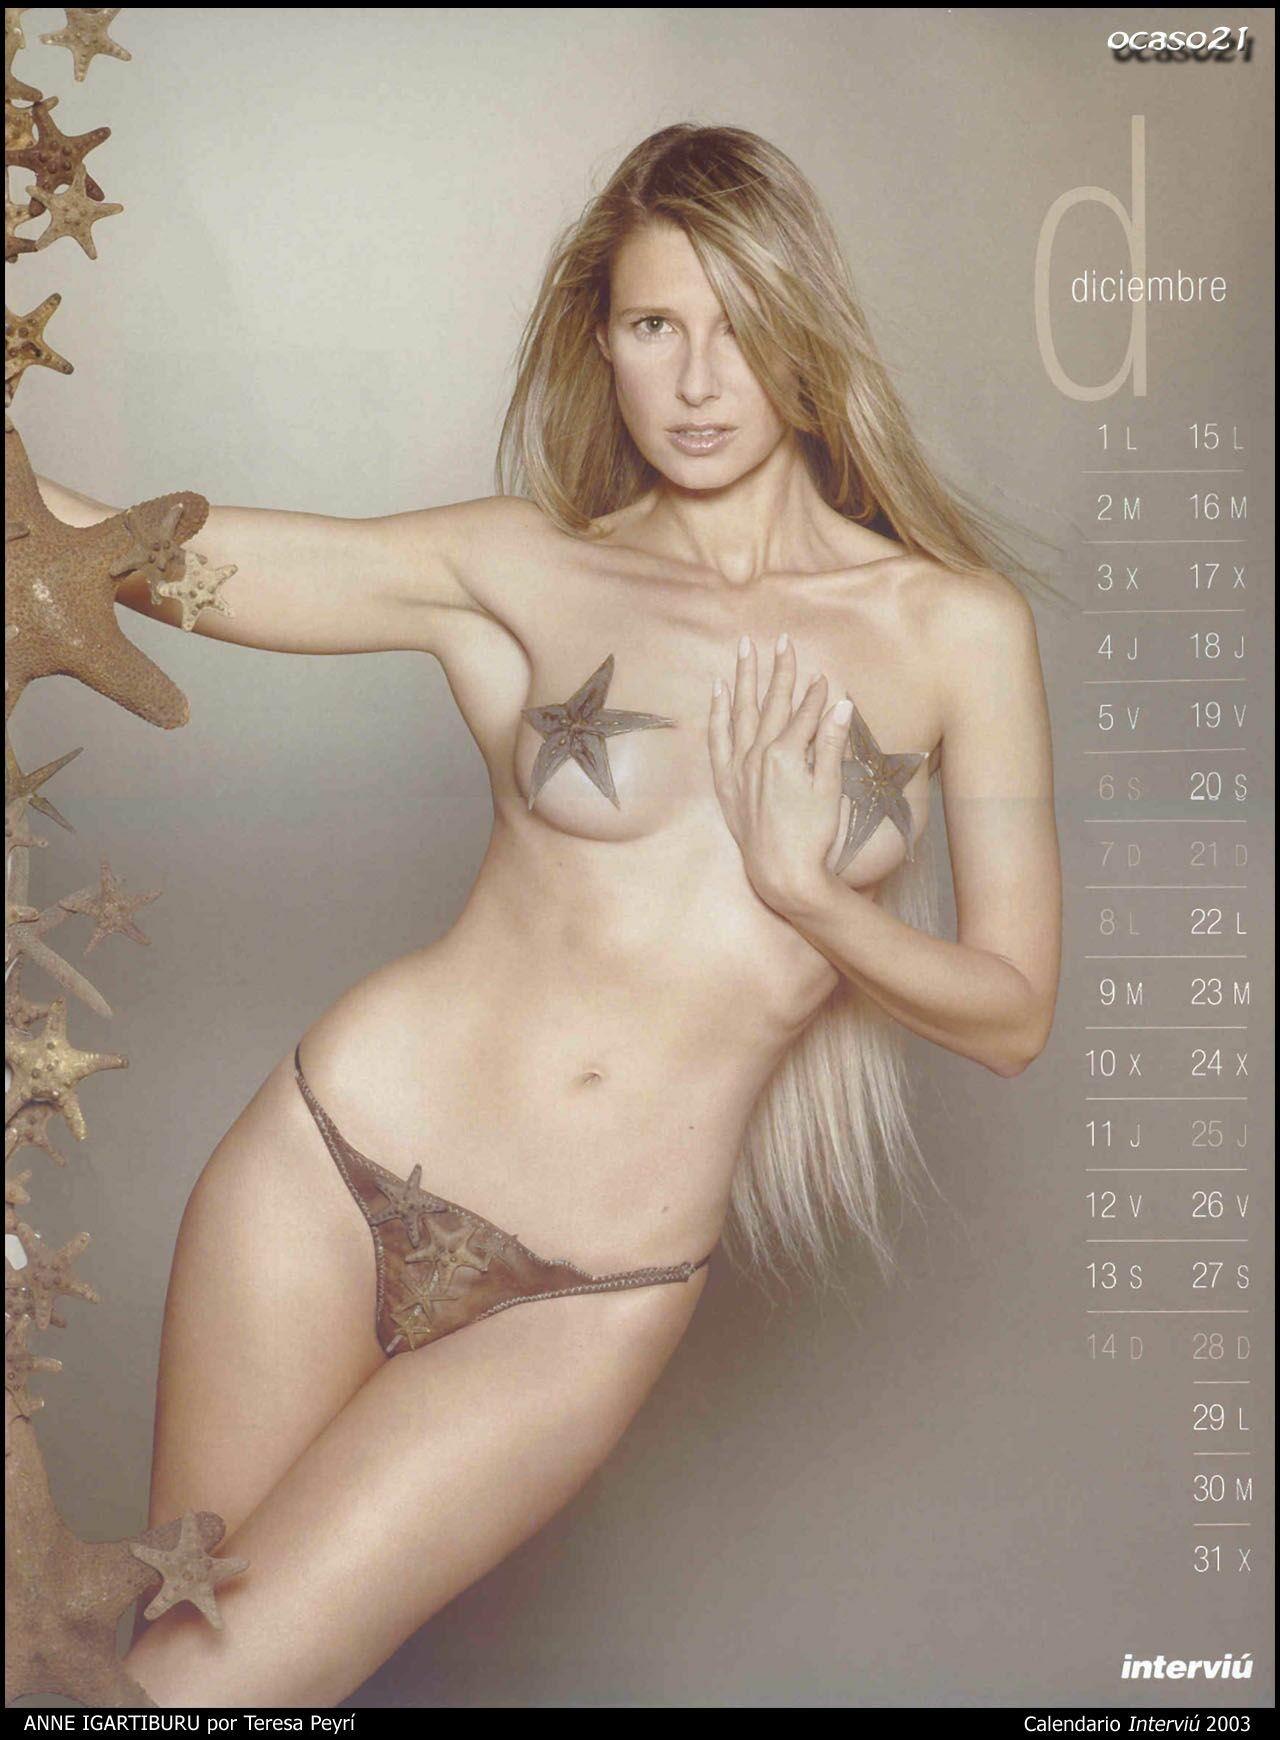 Fotos De Anne Igartiburu Desnuda Página 6 Fotos De Famosastk